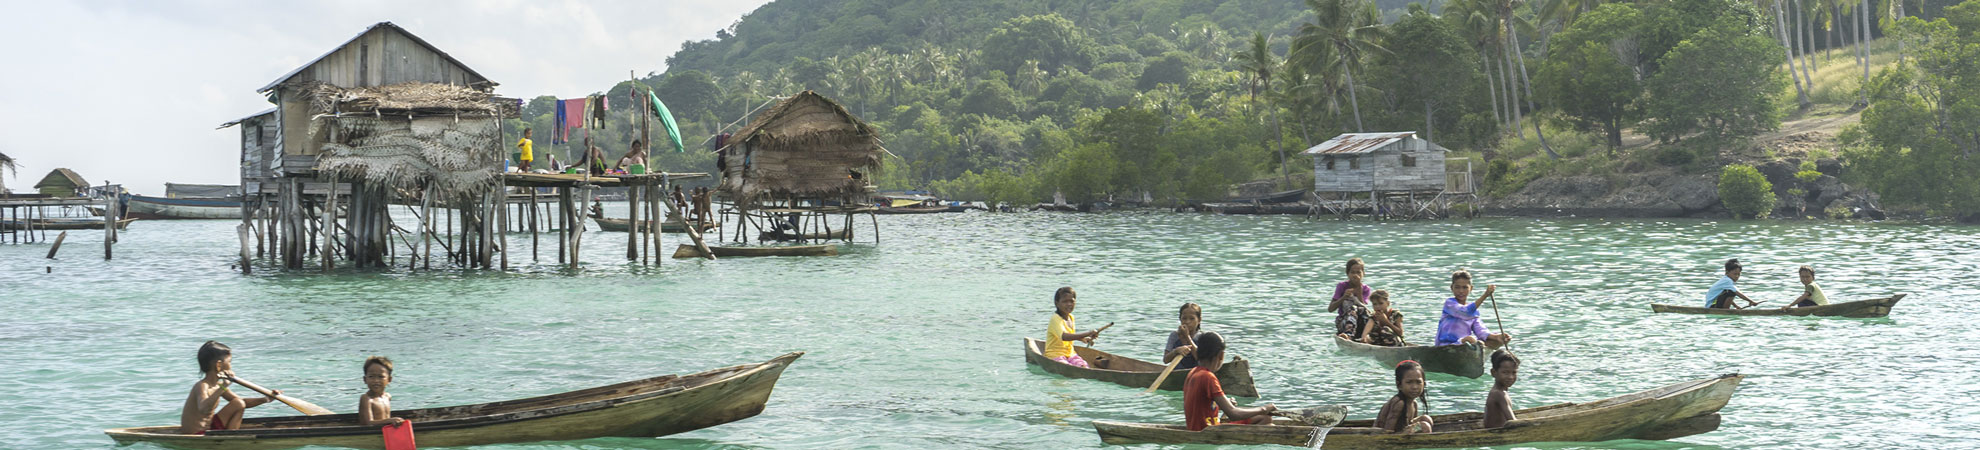 Voyage Bornéo